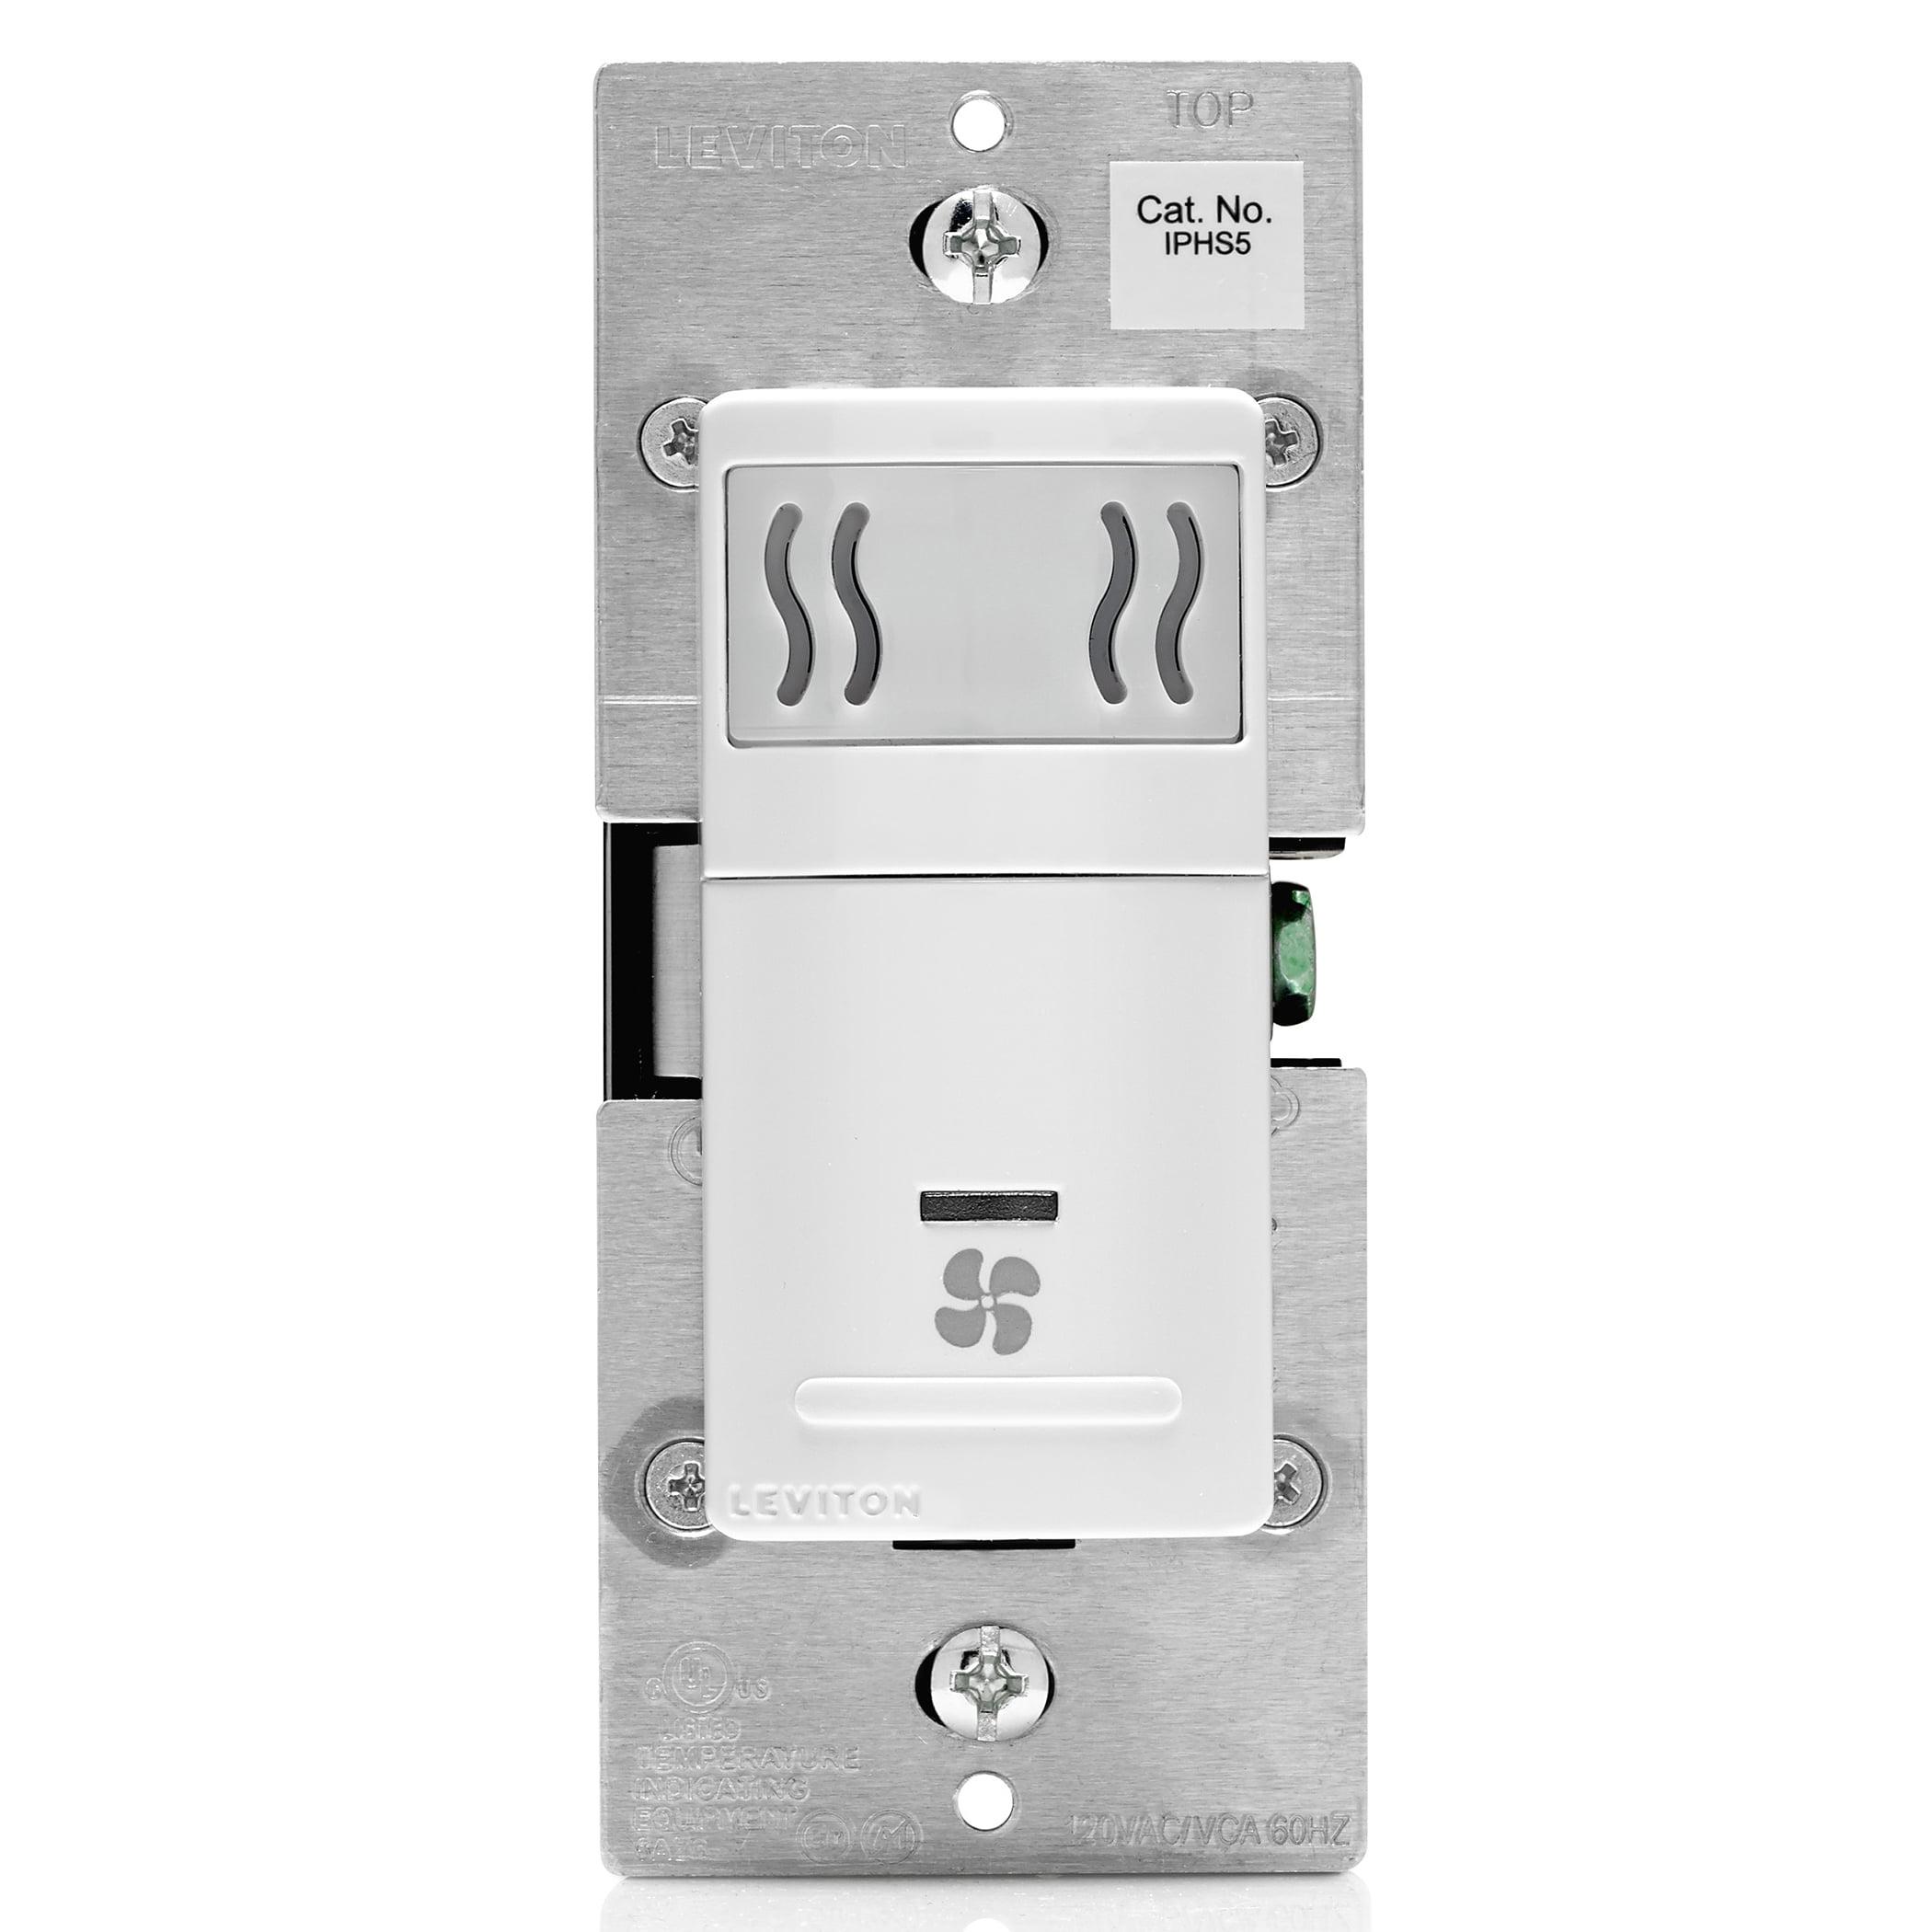 Leviton R02-IPHS5-0LW White Humidity Control Sensor